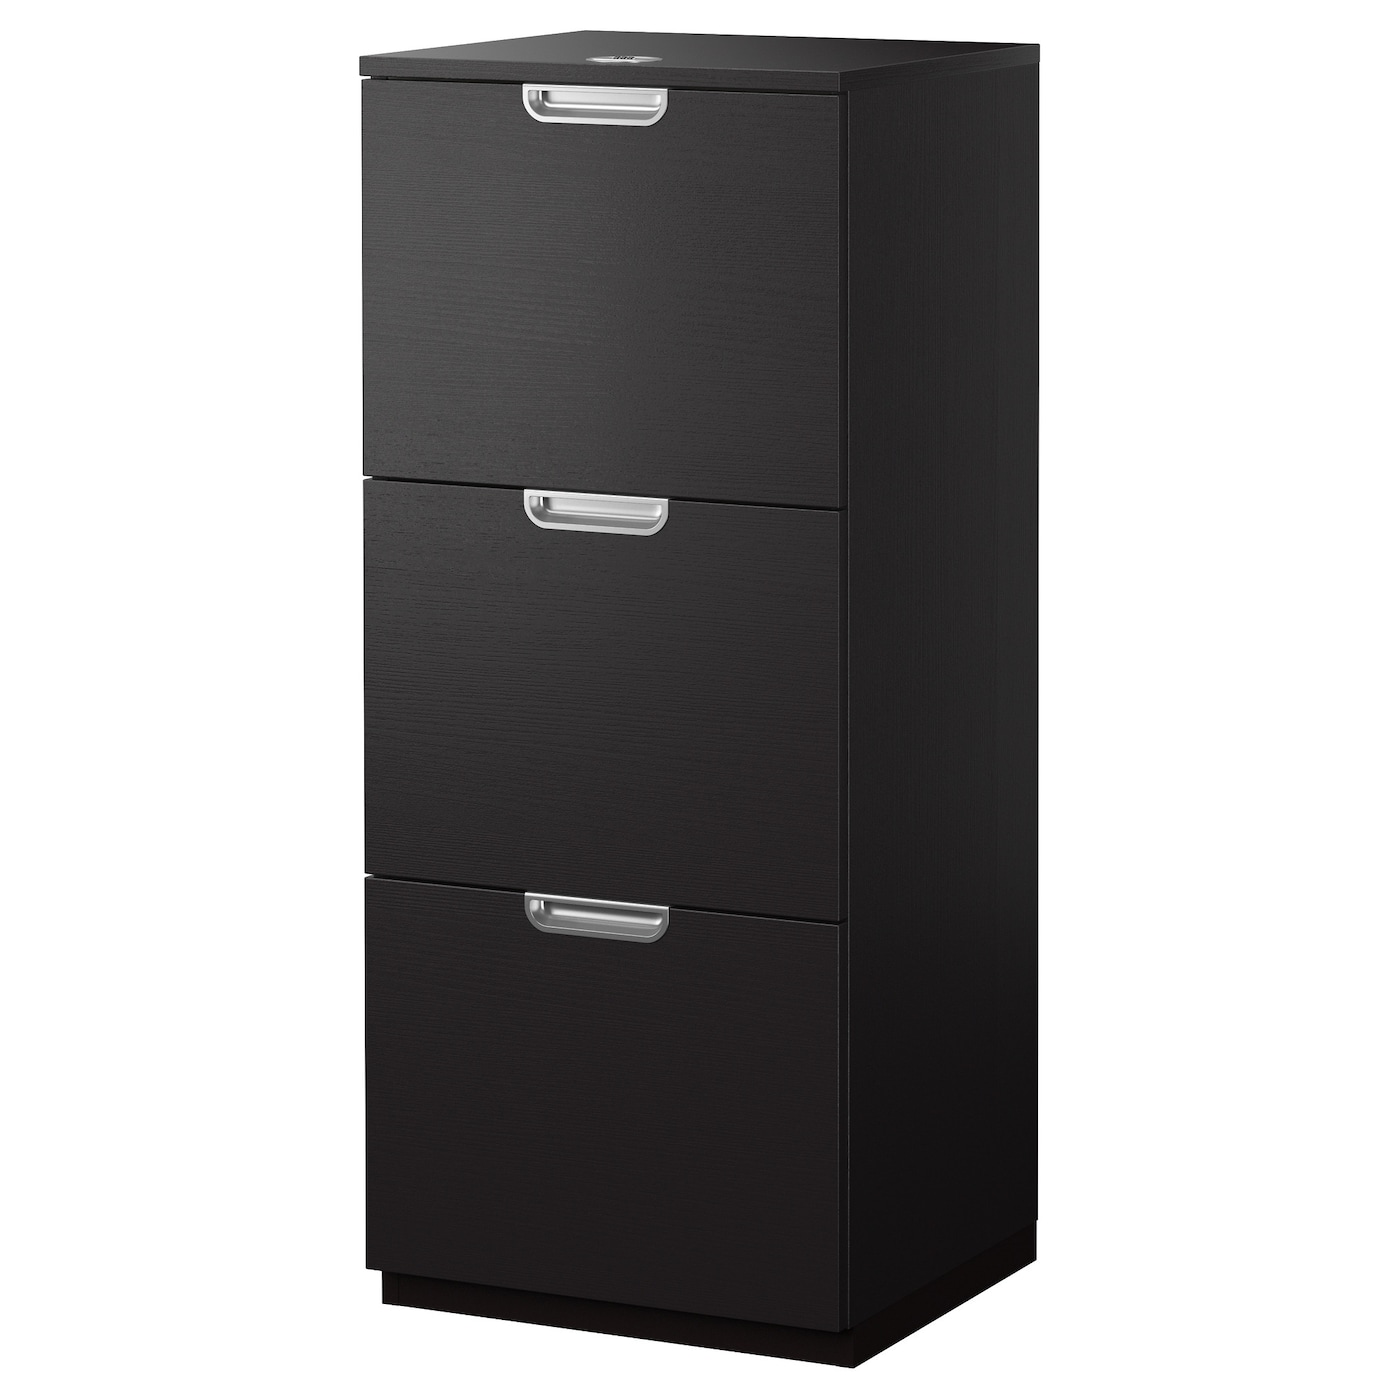 galant file cabinet black brown 51x120 cm ikea